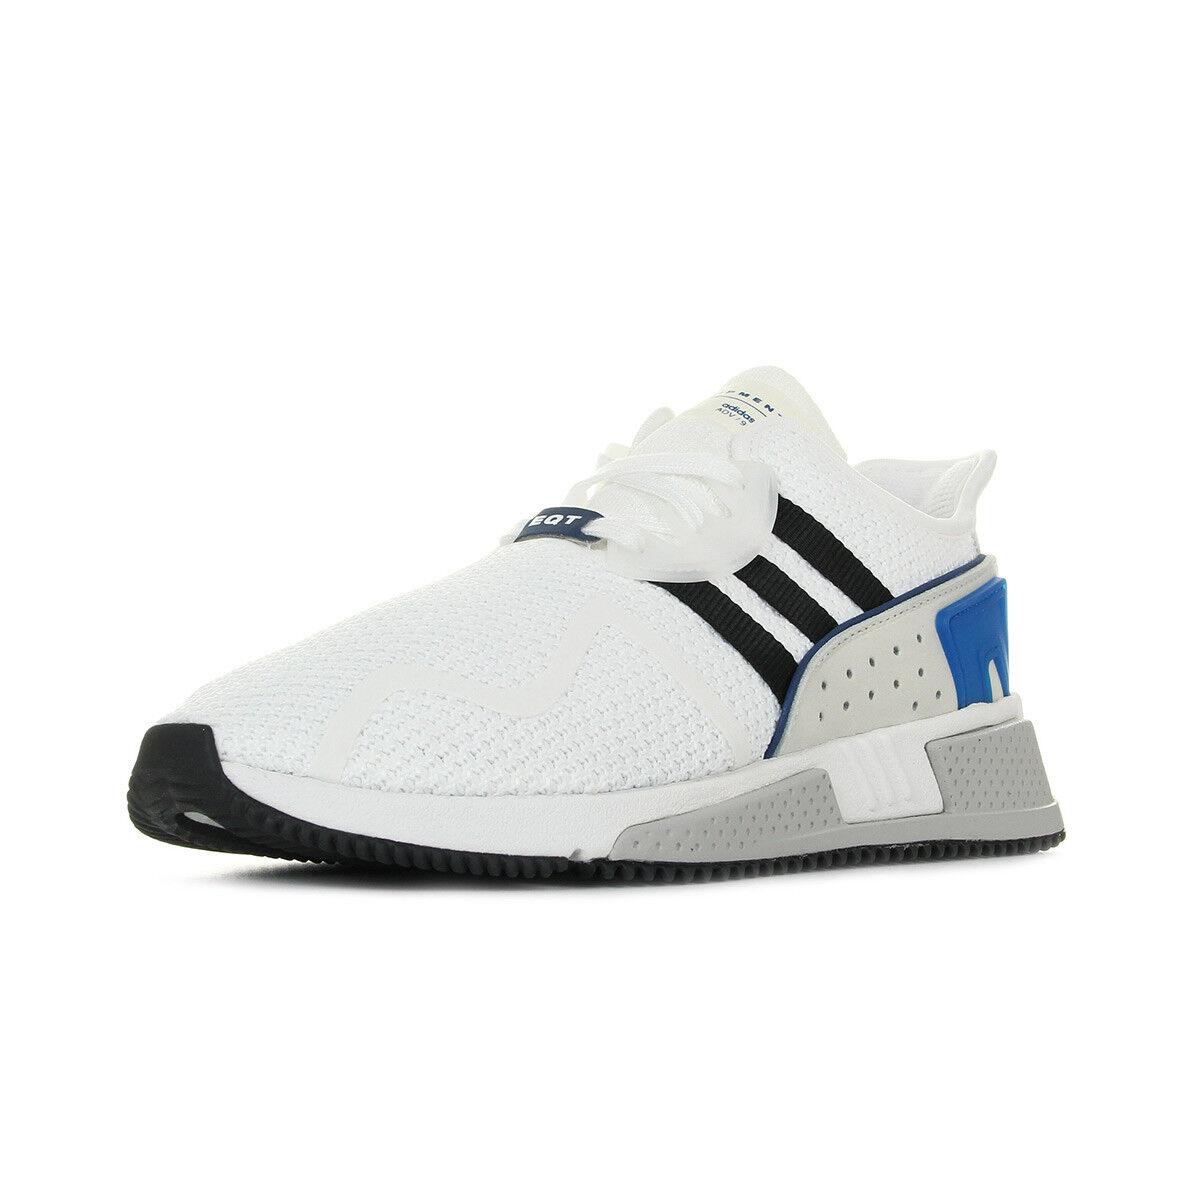 Schuhe adidas Herren Eqt Cushion Adv weiß